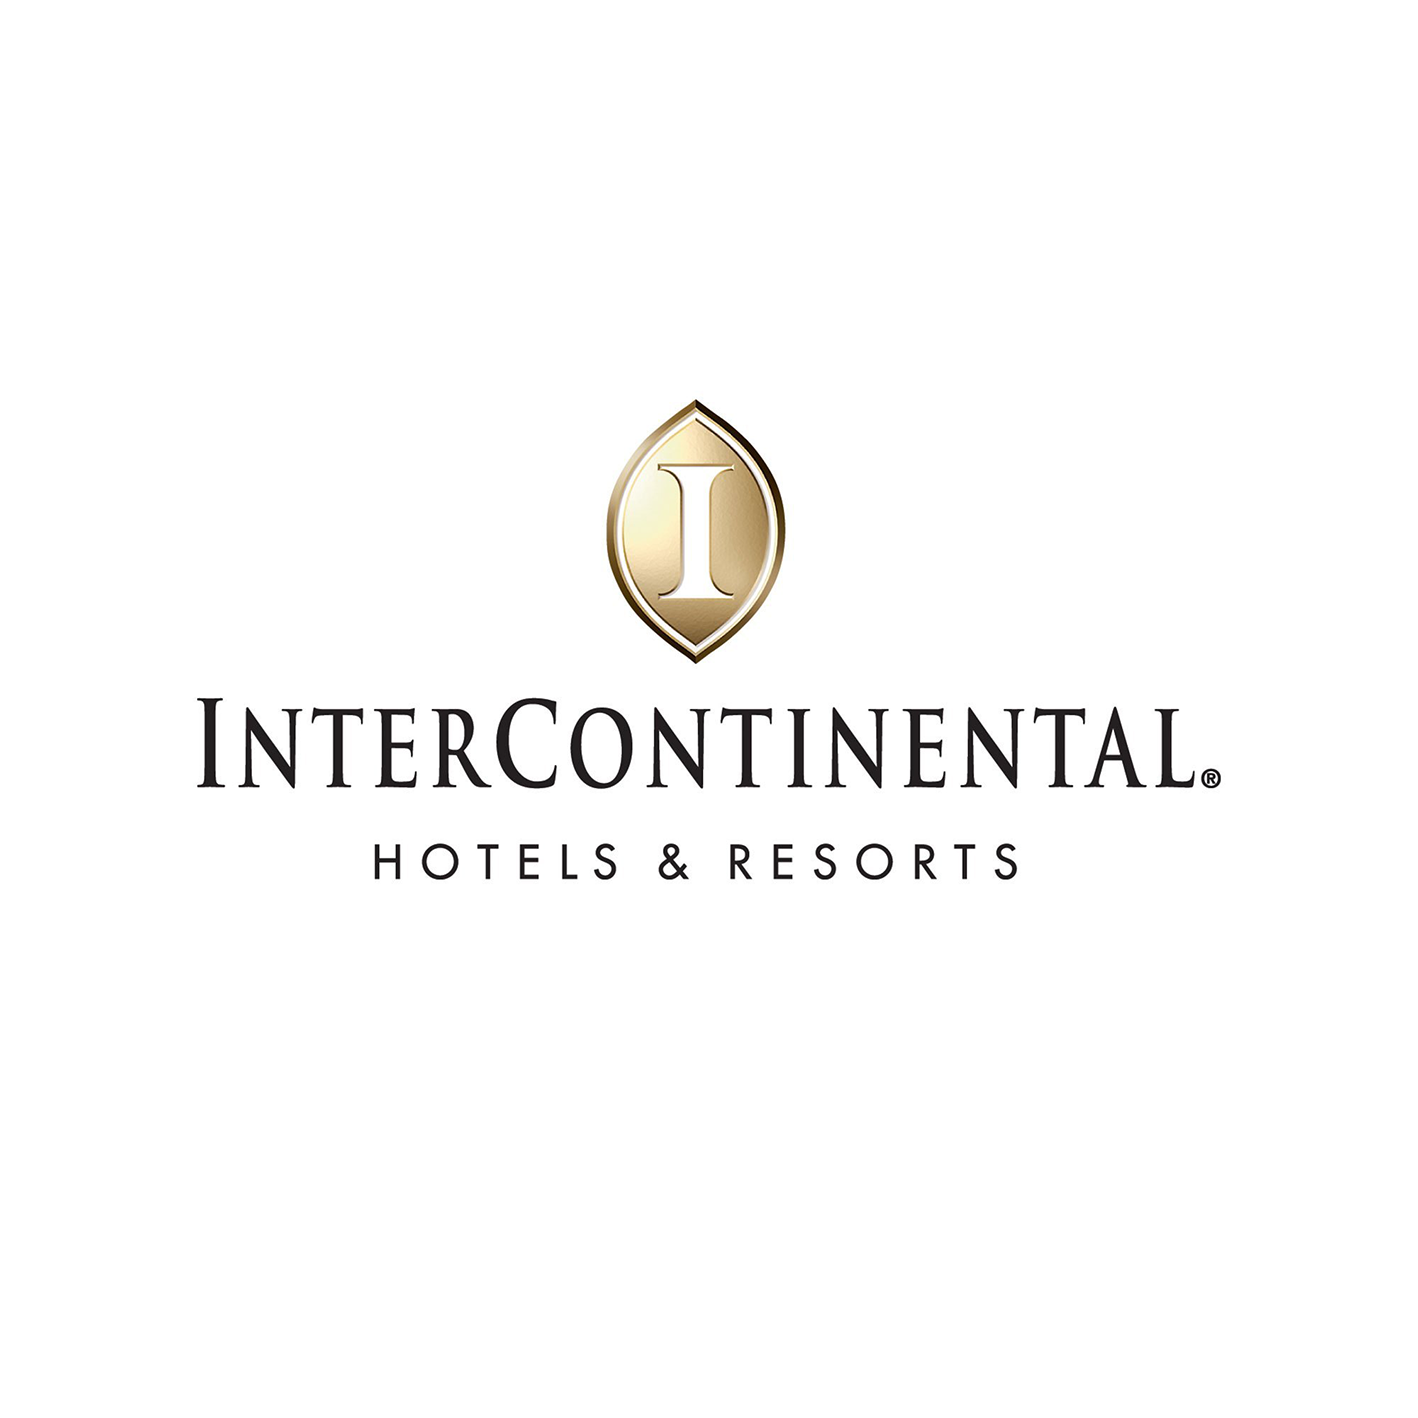 Intercontinental Hotels & Resorts.png